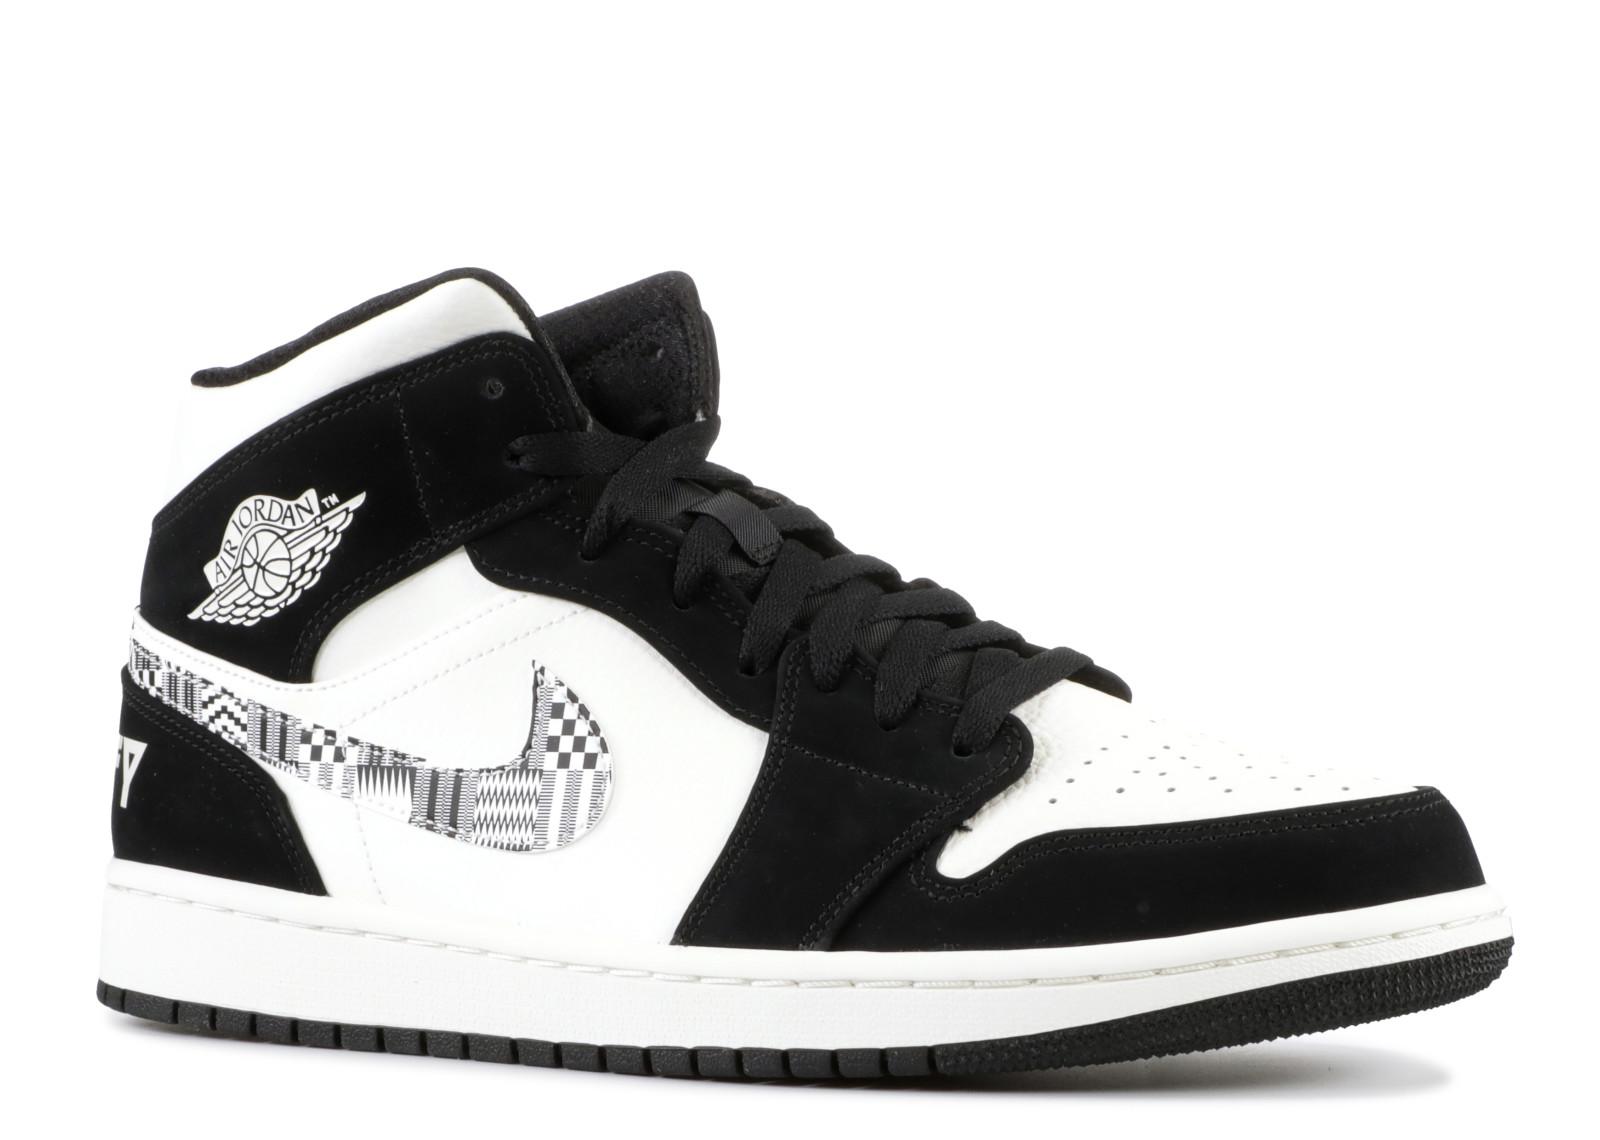 separation shoes a3c55 b13ad Jordan 1 Mid Equality (2019) - 1